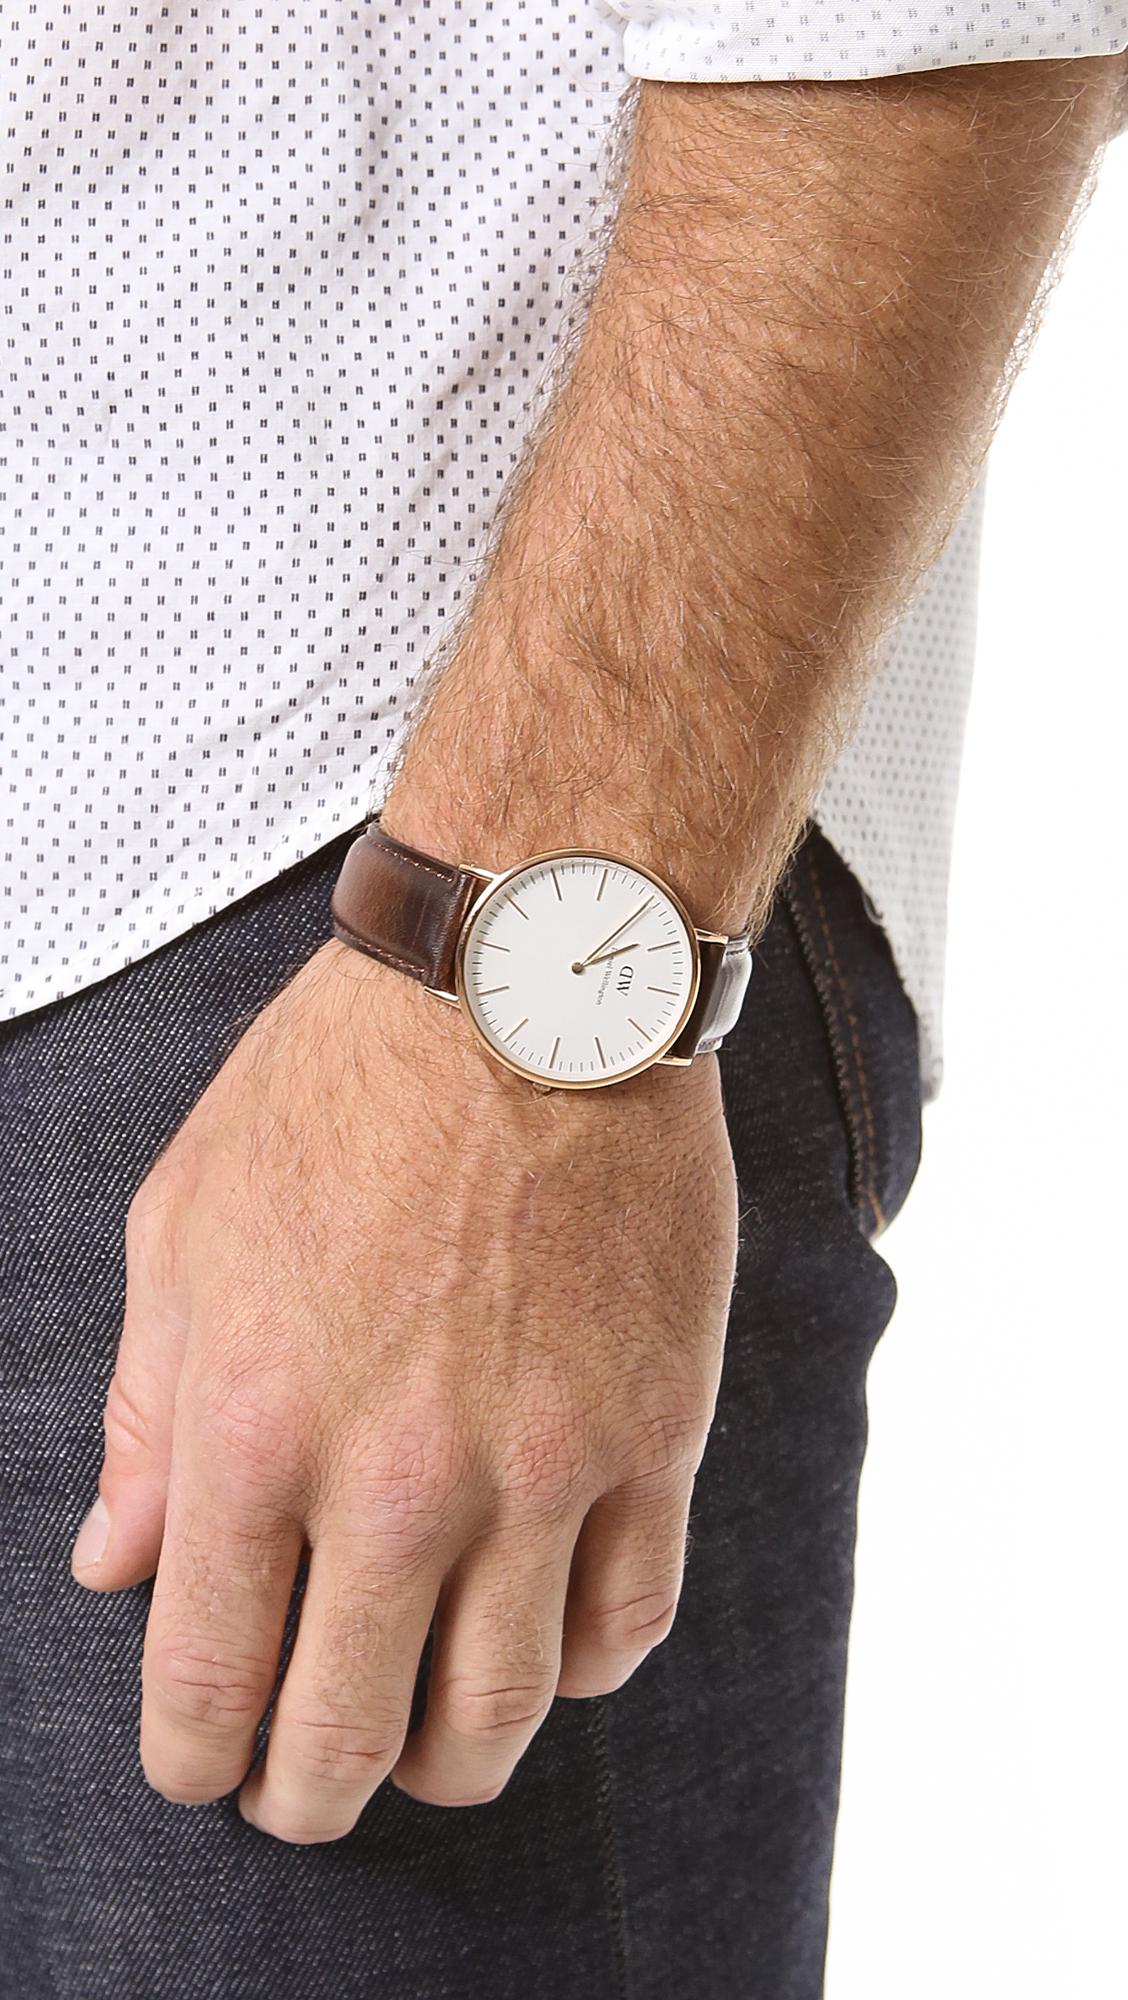 Daniel Wellington Classic White Alice eWatches Source · Daniel Wellington Classic watch DW00100277 Watches Source Gallery